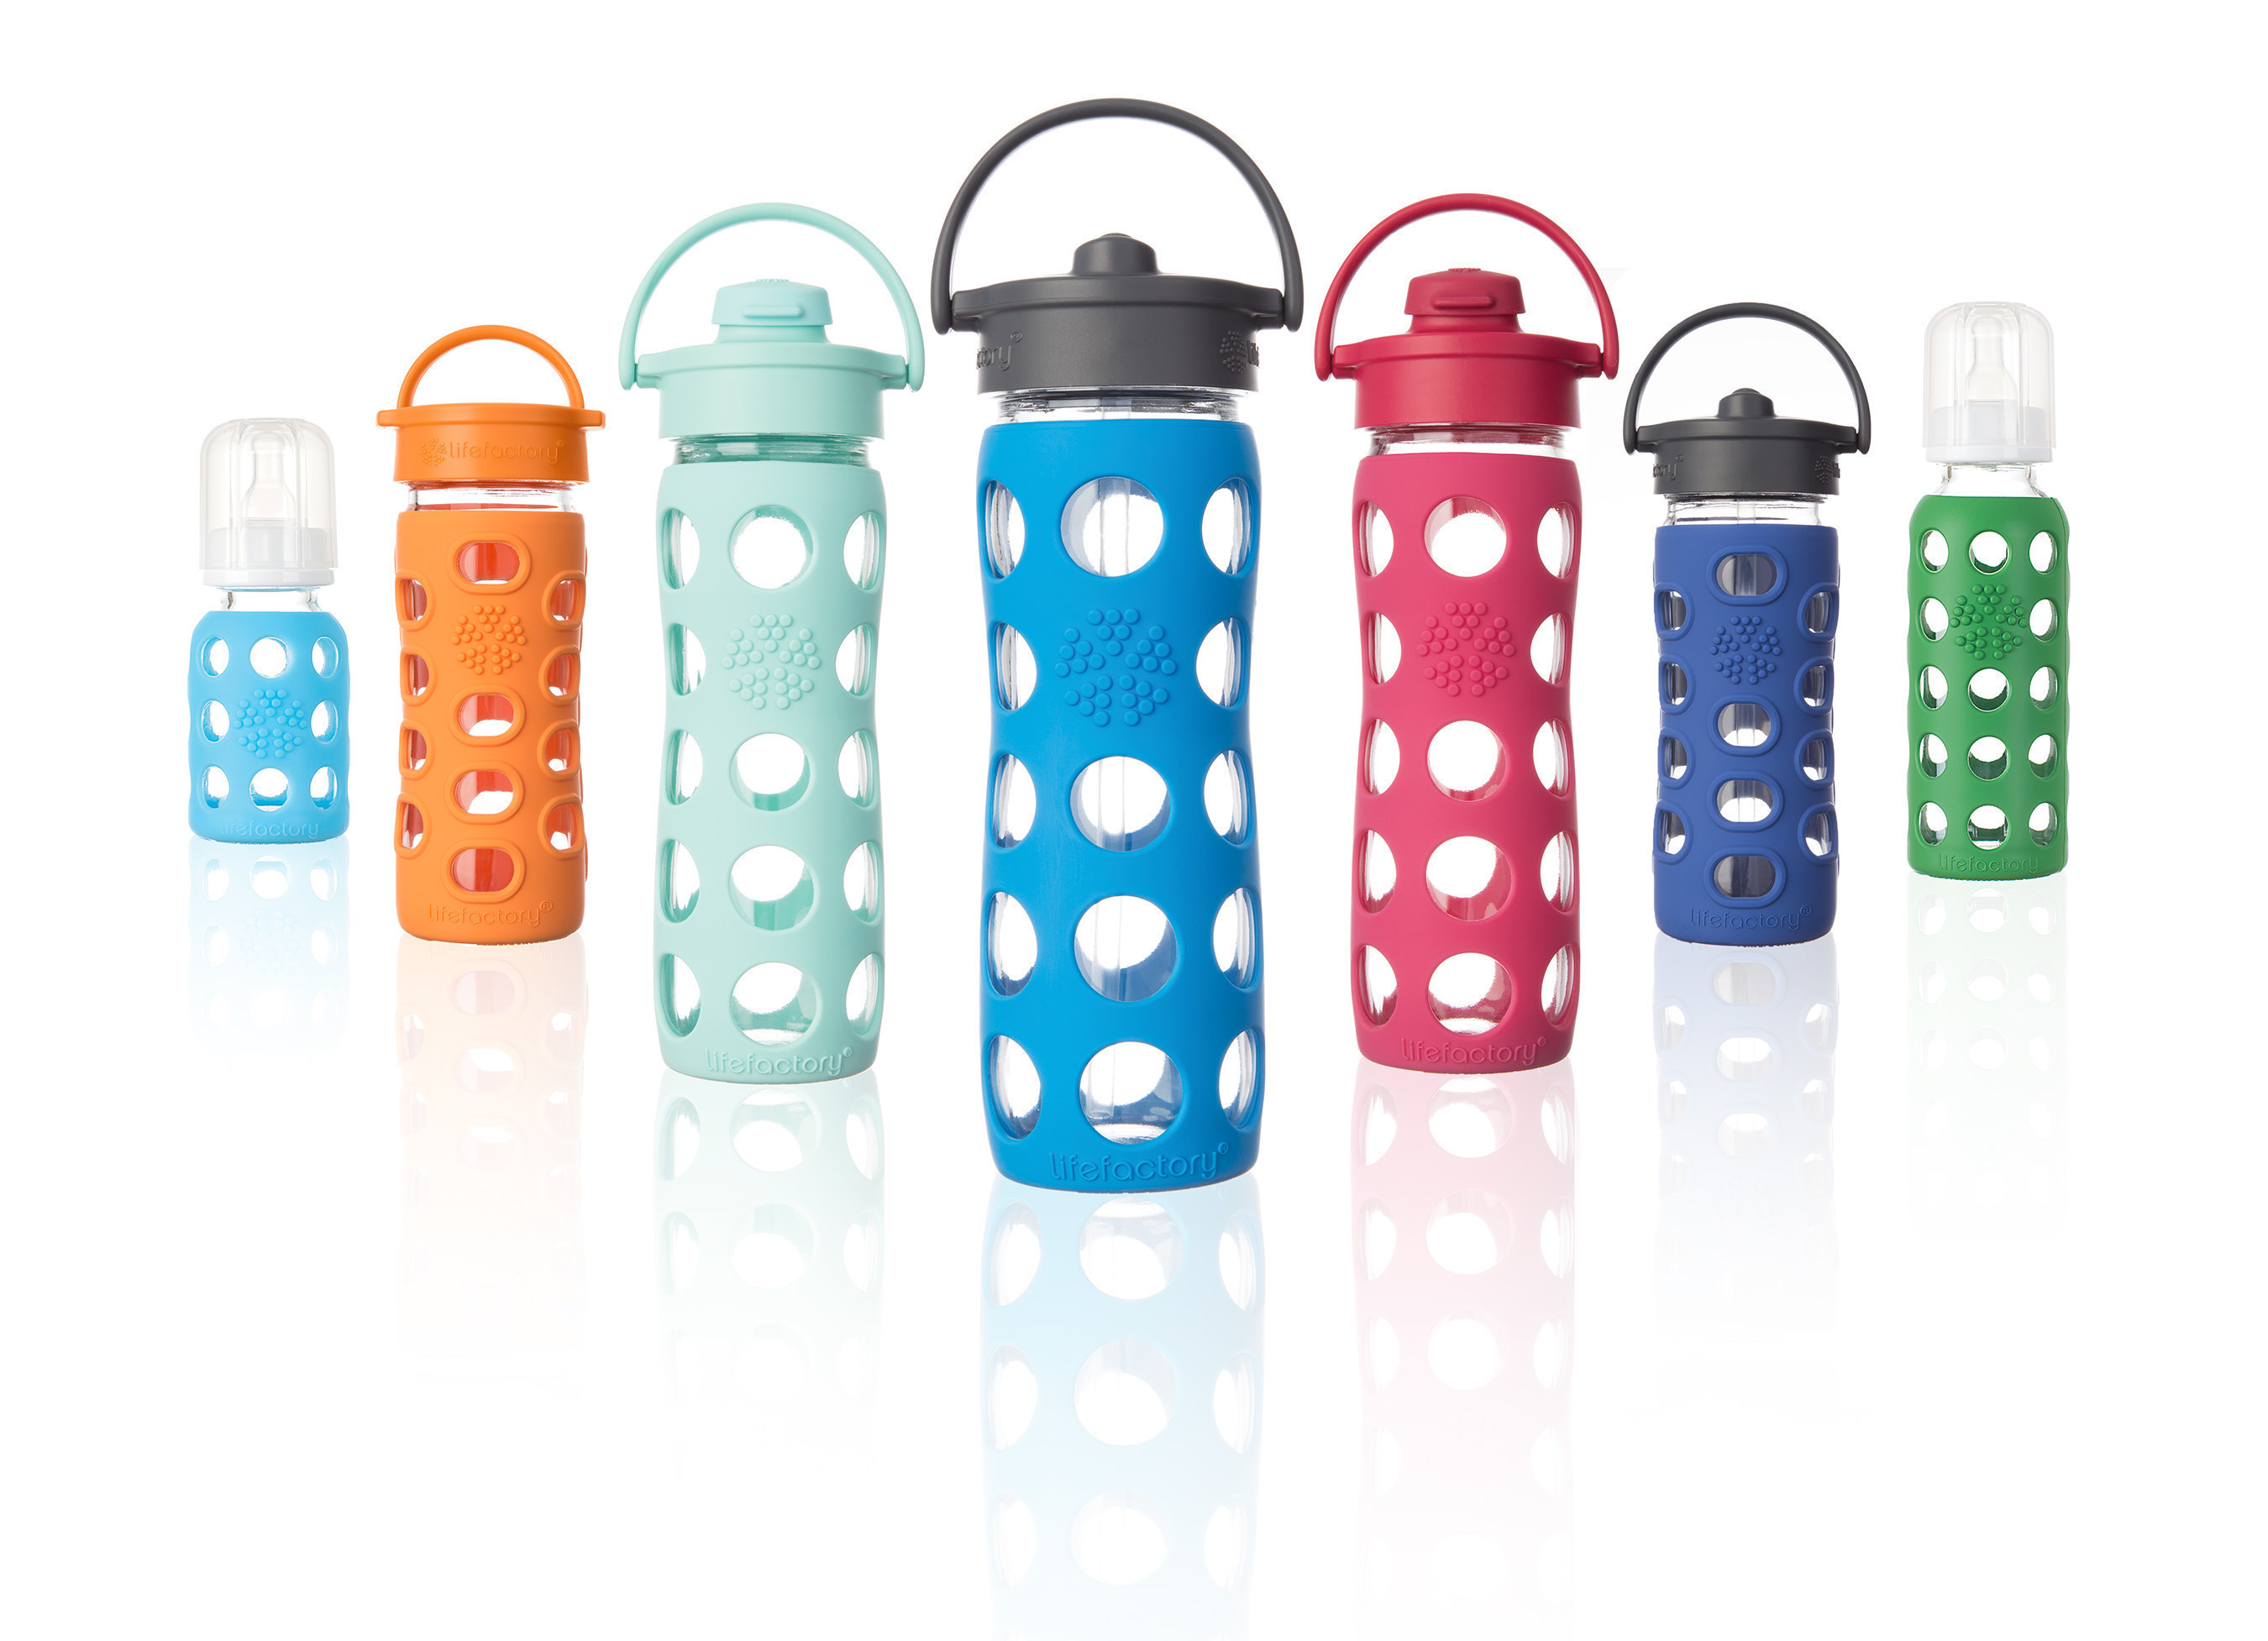 Lifefactory Glass Bottles